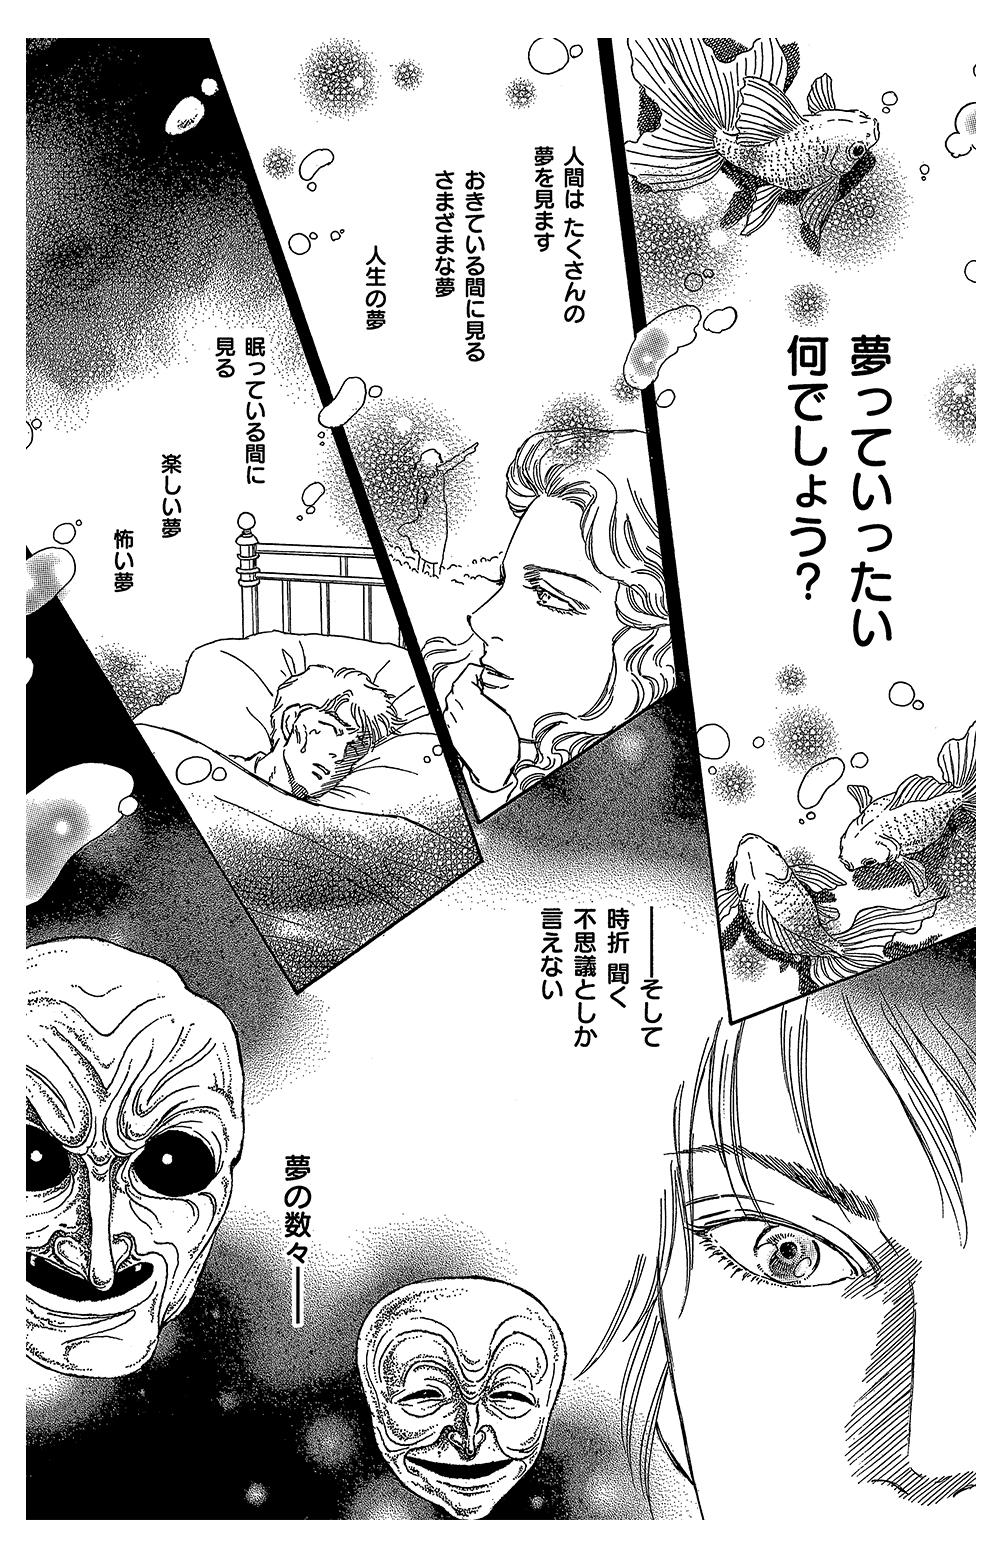 okaruto2-1-2.jpg